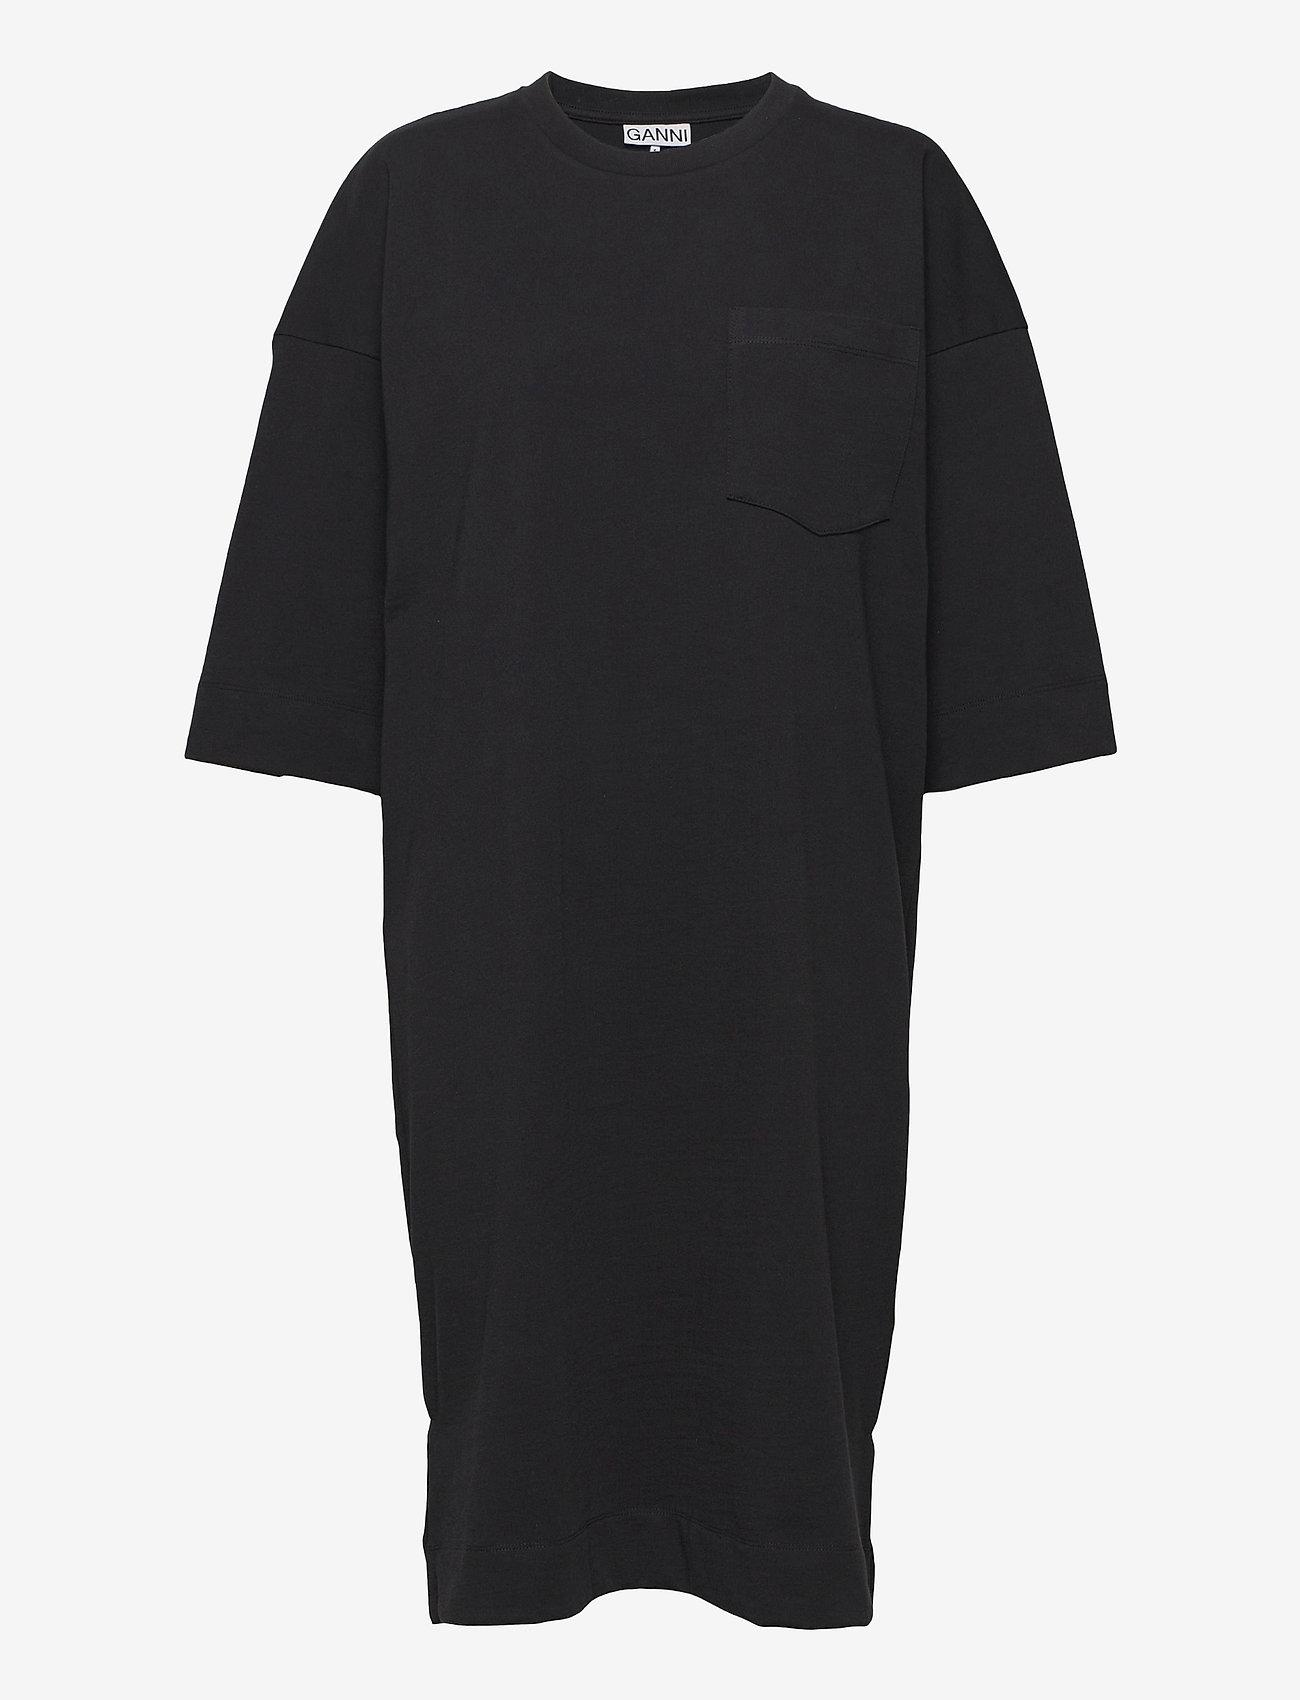 Ganni - Software Jersey - t-shirtkjoler - black - 0